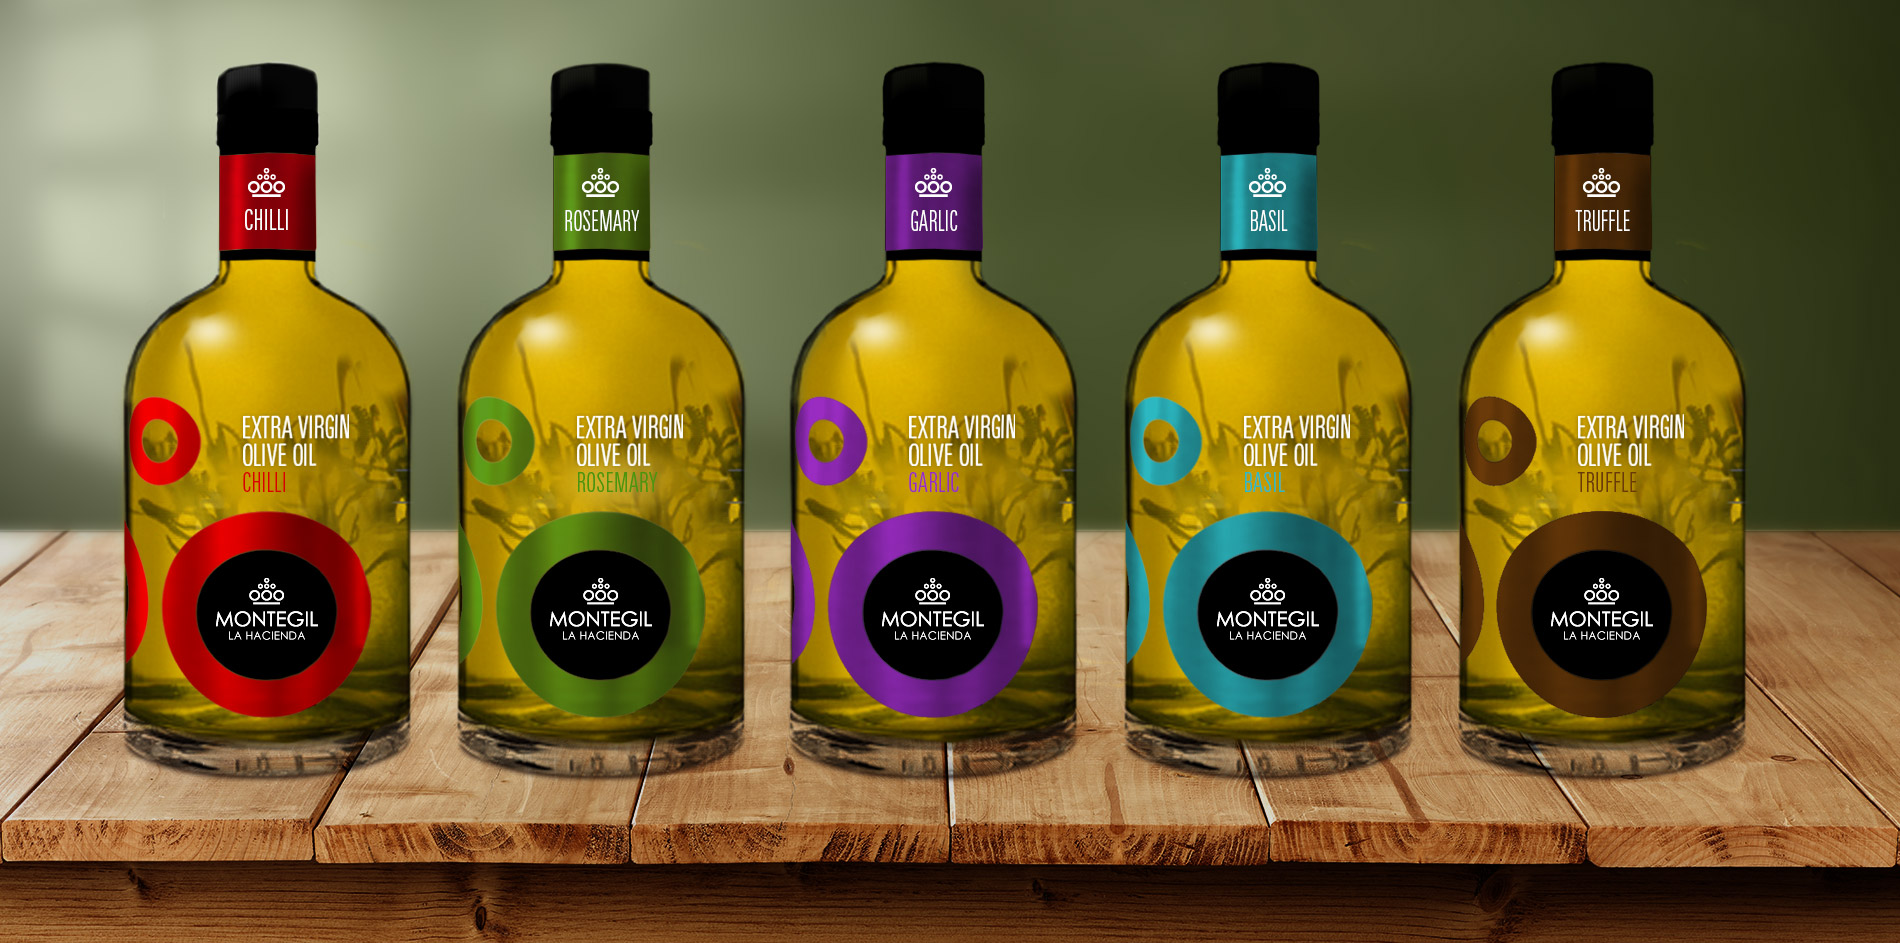 Línea gourmet de aceites aromáticos Montegil